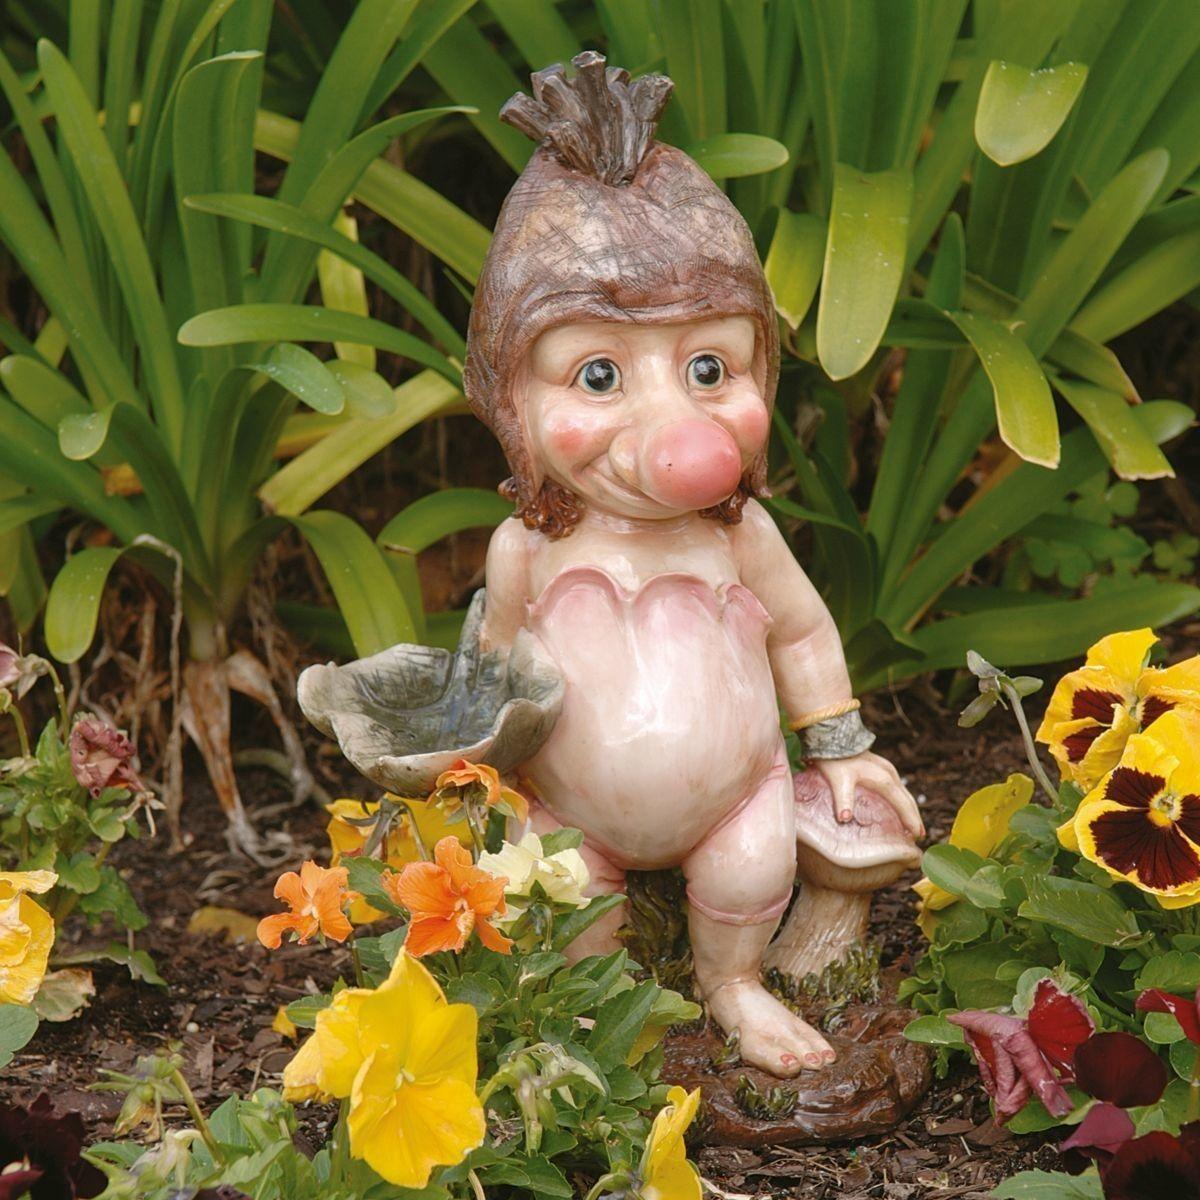 Ollie The Garden Troll Statue